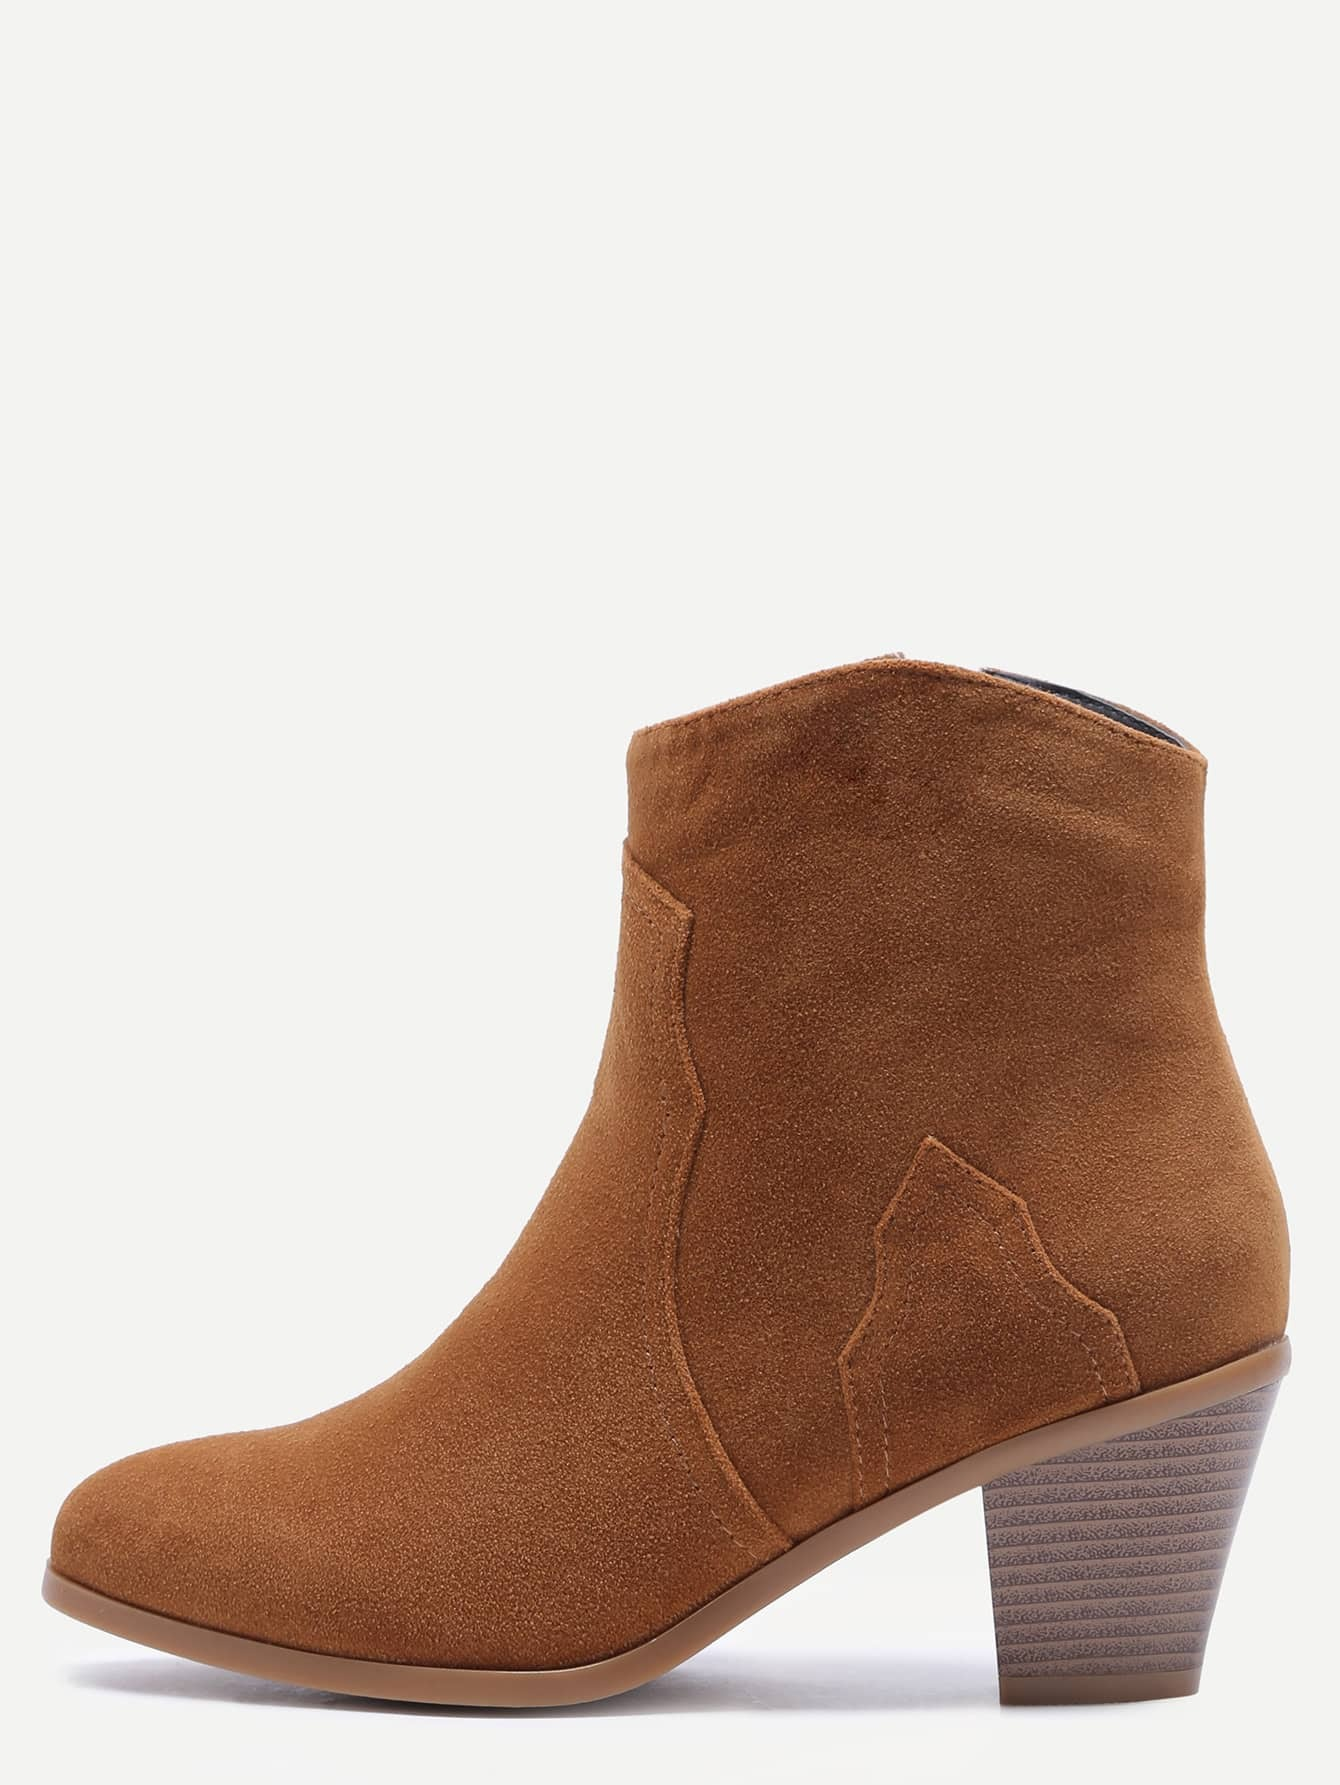 Camel Nubuck Leather Almond Toe Chunky Heel BootiesCamel Nubuck Leather Almond Toe Chunky Heel Booties<br><br>color: Camel<br>size: EUR36,EUR37,EUR38,EUR39,EUR40,EUR41